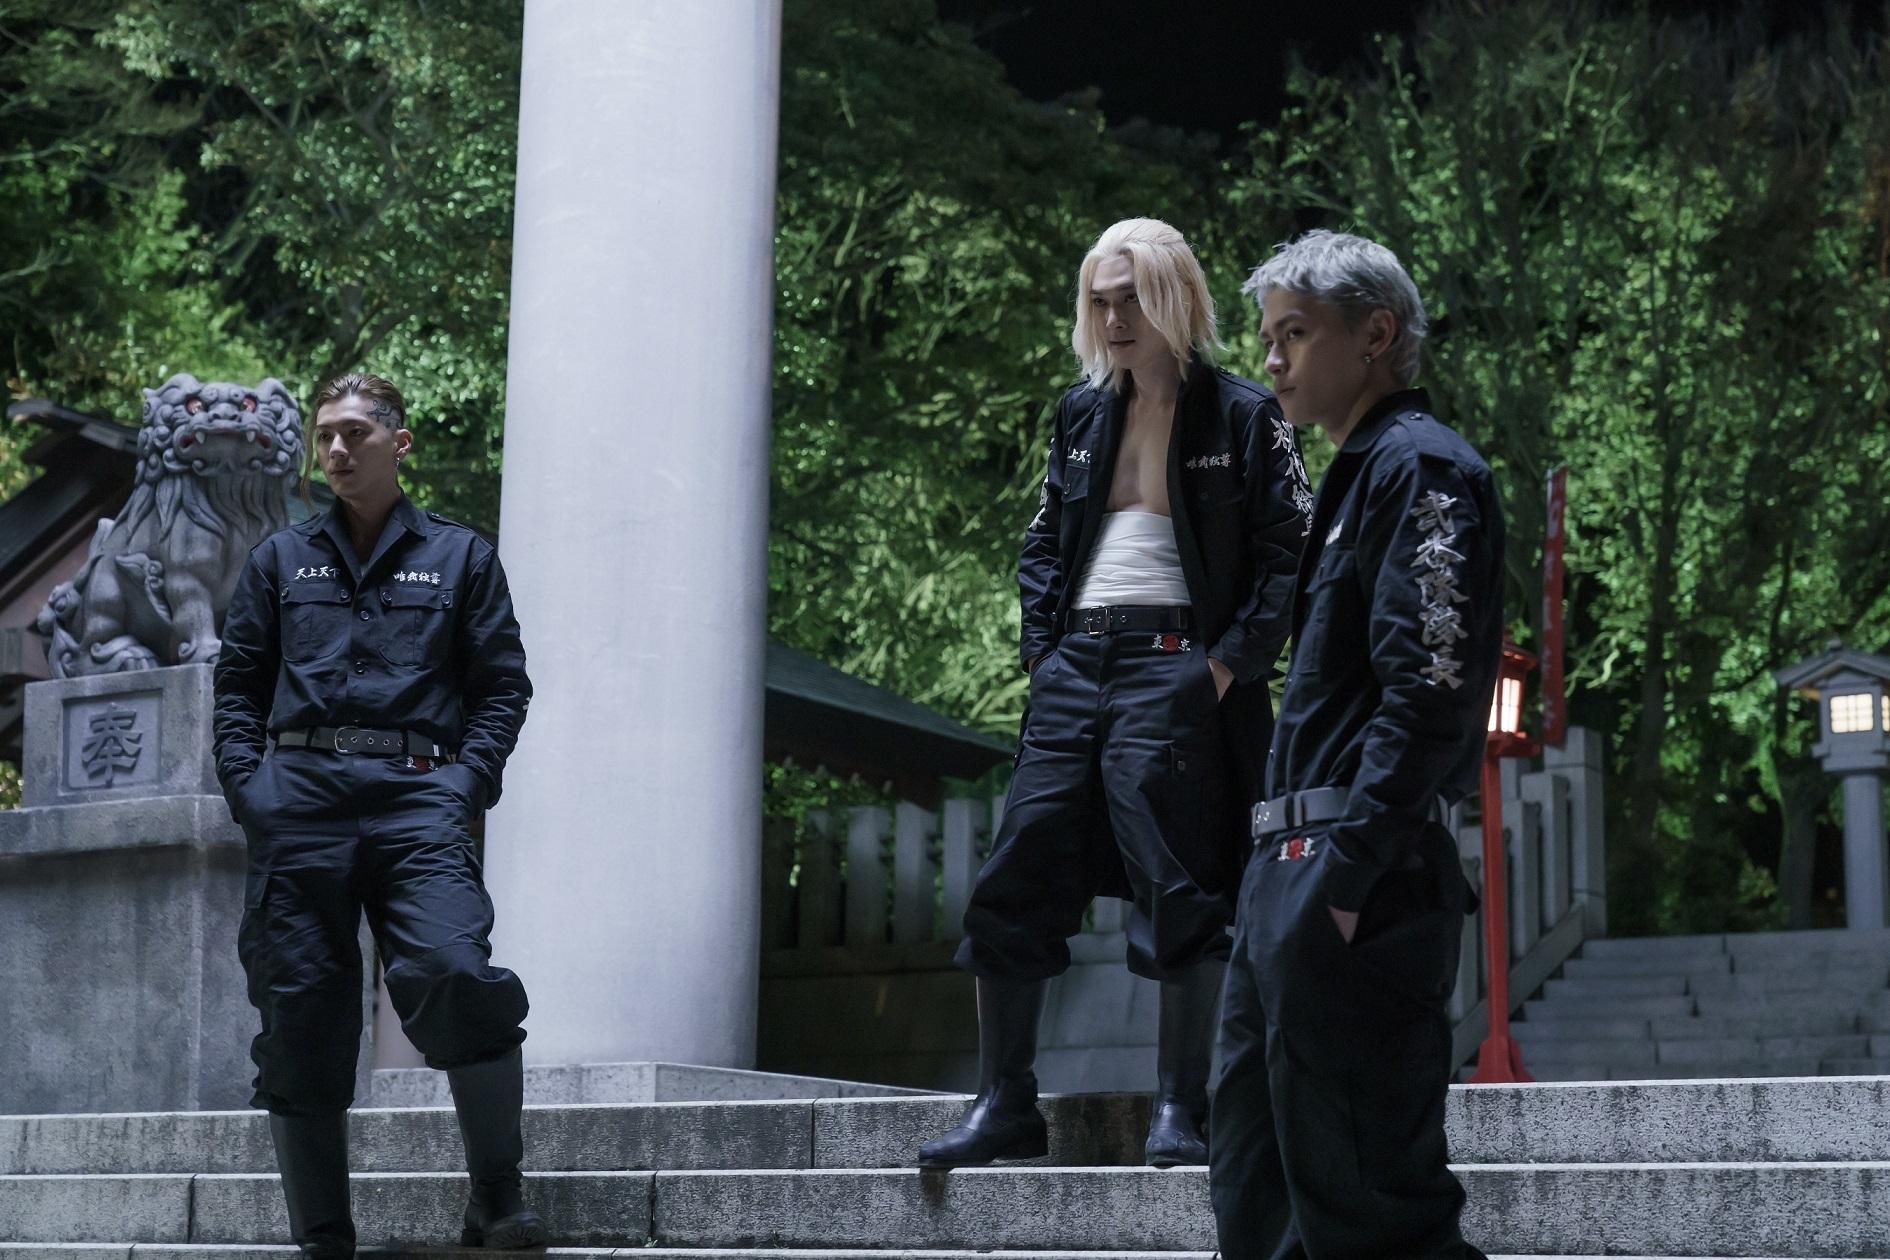 (C)和久井健/講談社 (C)2020 映画「東京リベンジャーズ」製作委員会